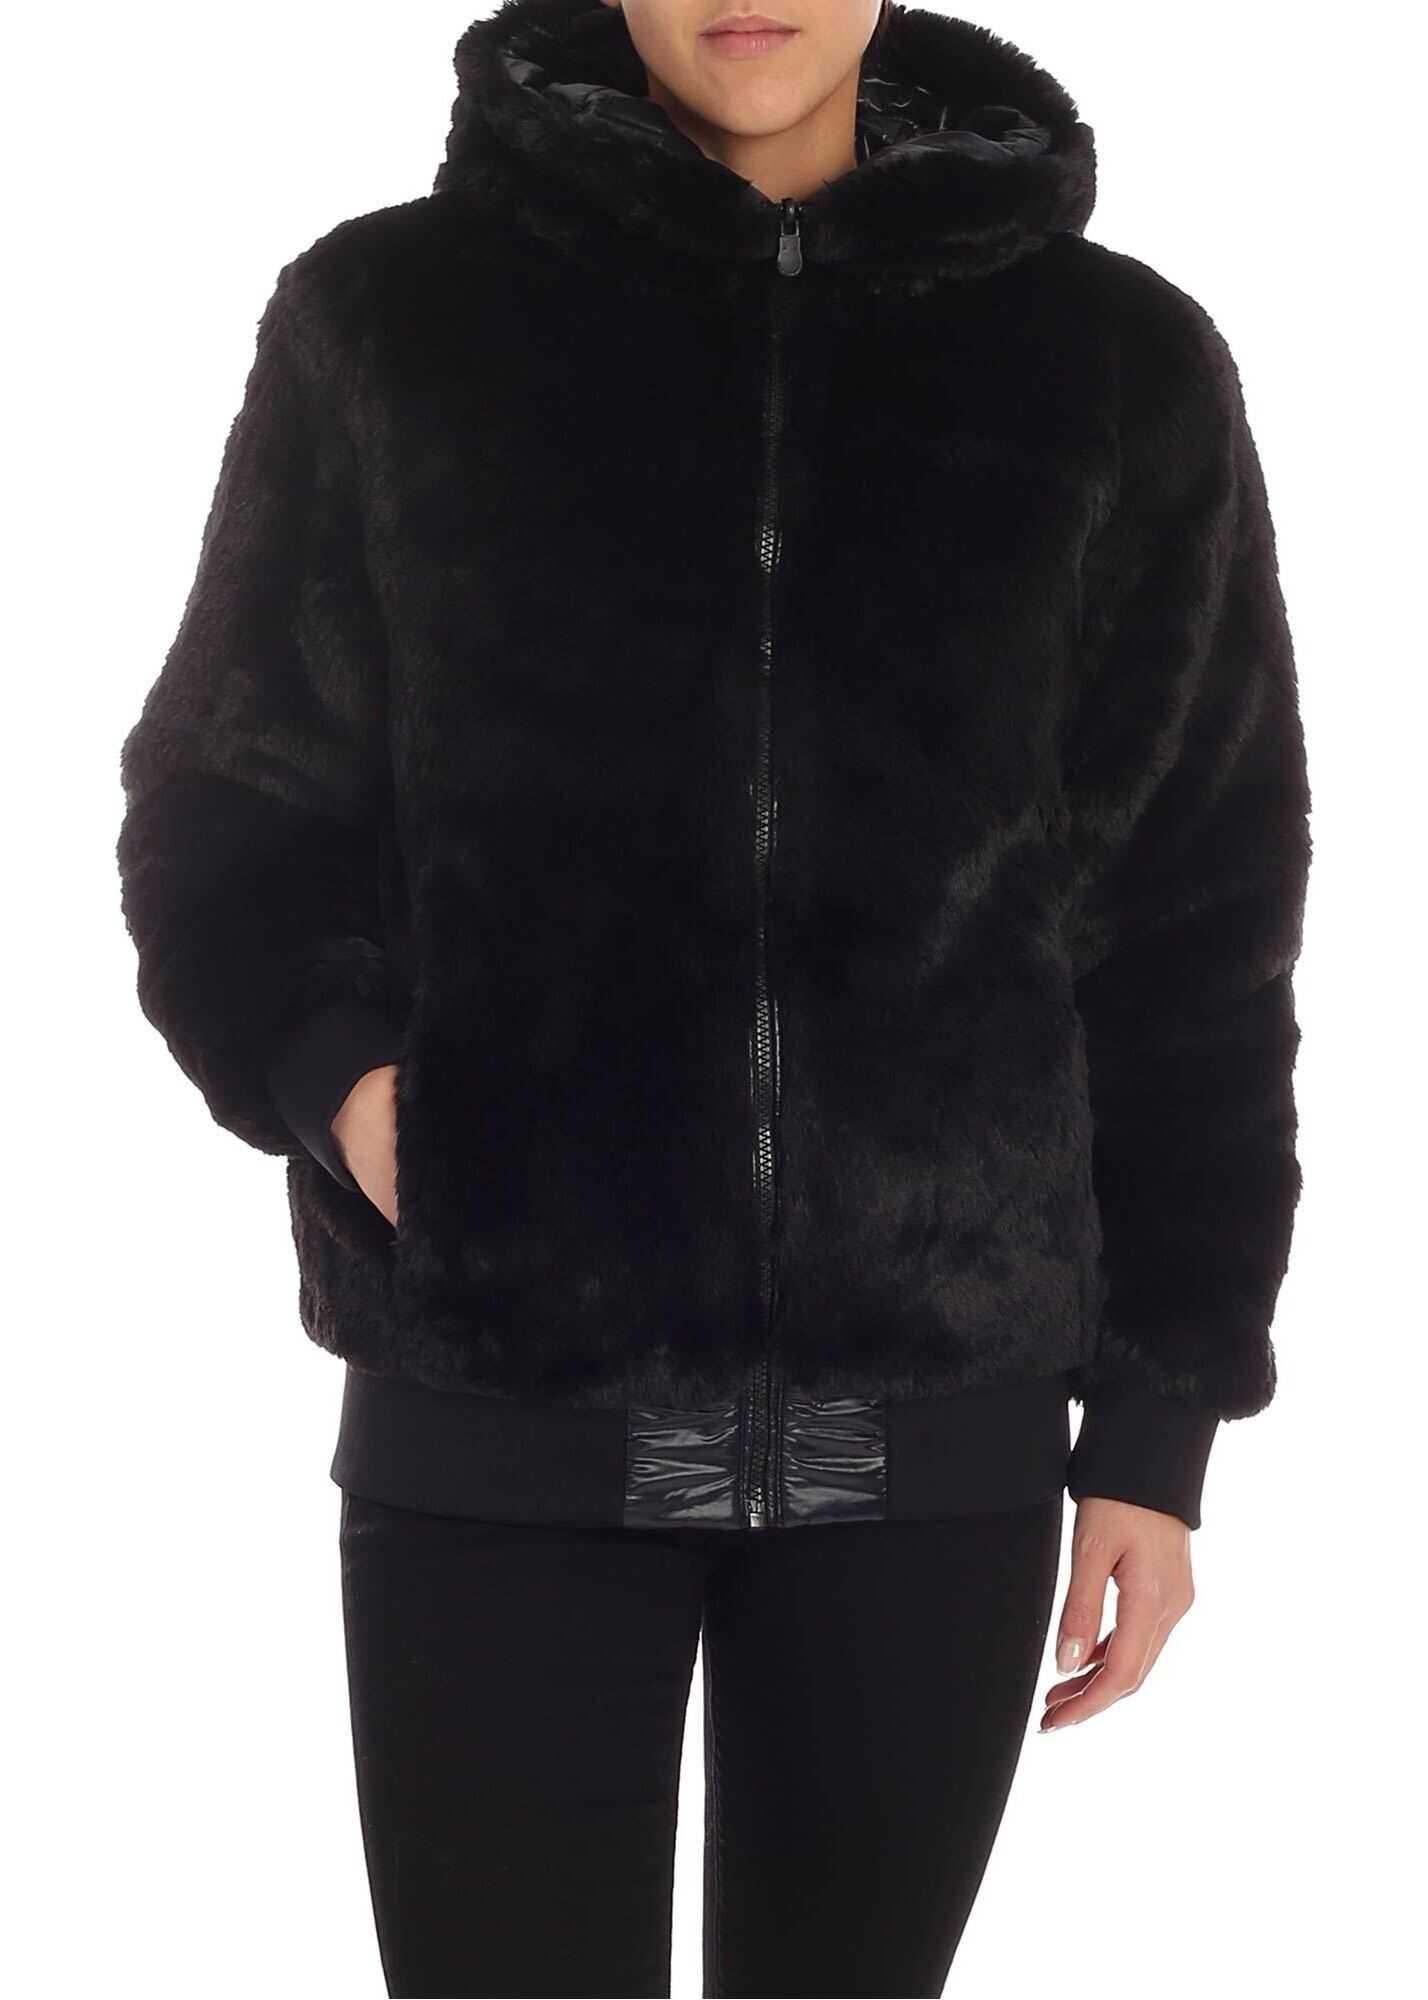 Save the Duck Black Eco-Fur Down Jacket Black